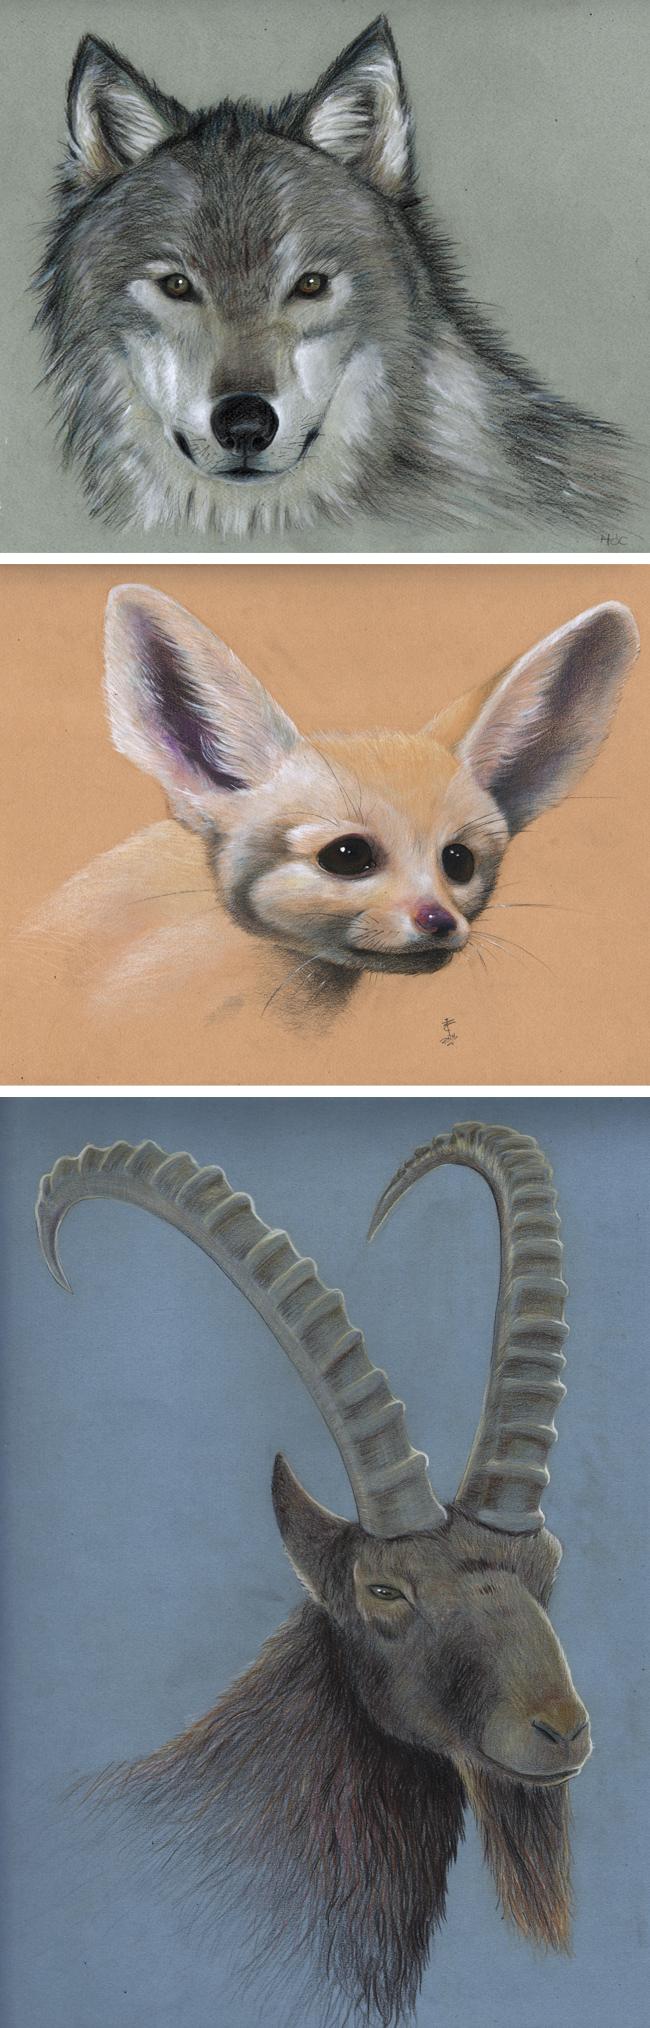 animales-trabajos-alumnos-masterc10-ilustracion-lapices-madrid-academiac10